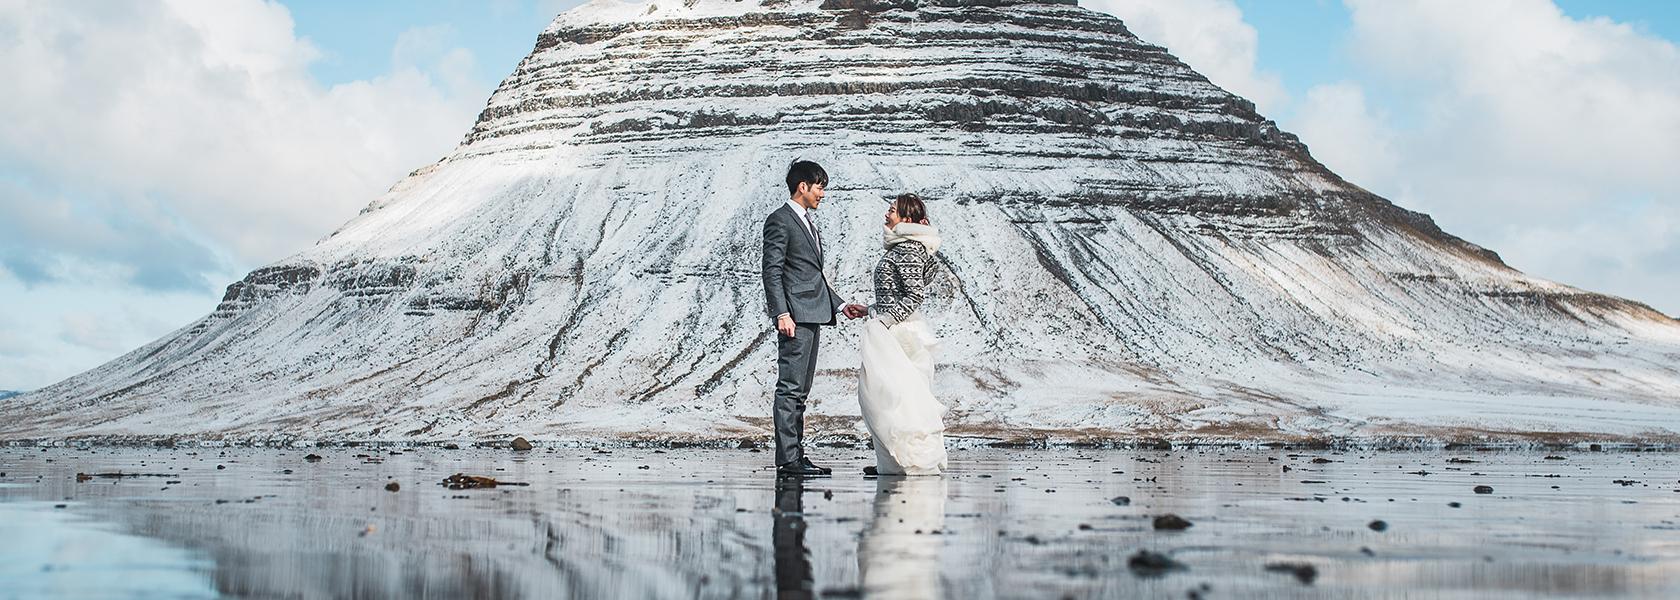 Nordica photography 05